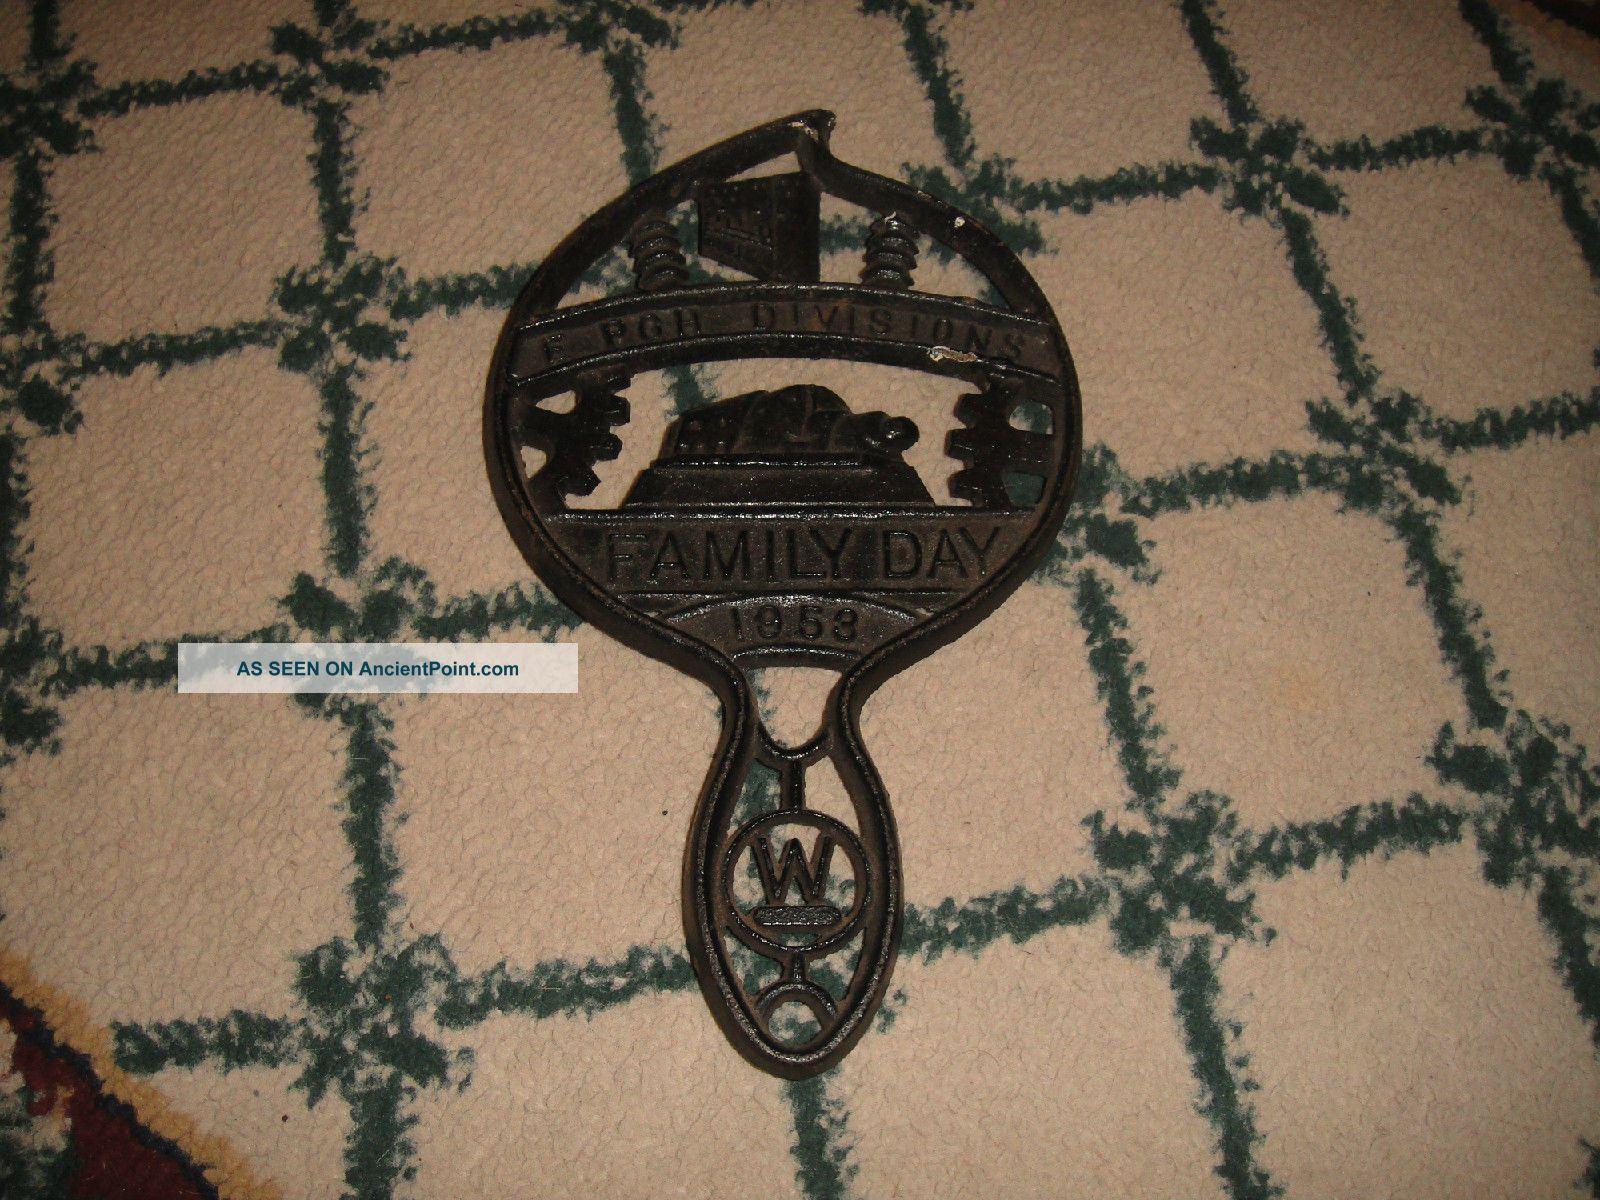 Vintage Cast Iron Trivet - Epgh Divisions Family Day 1953 - Rare - Gears - Machine Shop Trivets photo